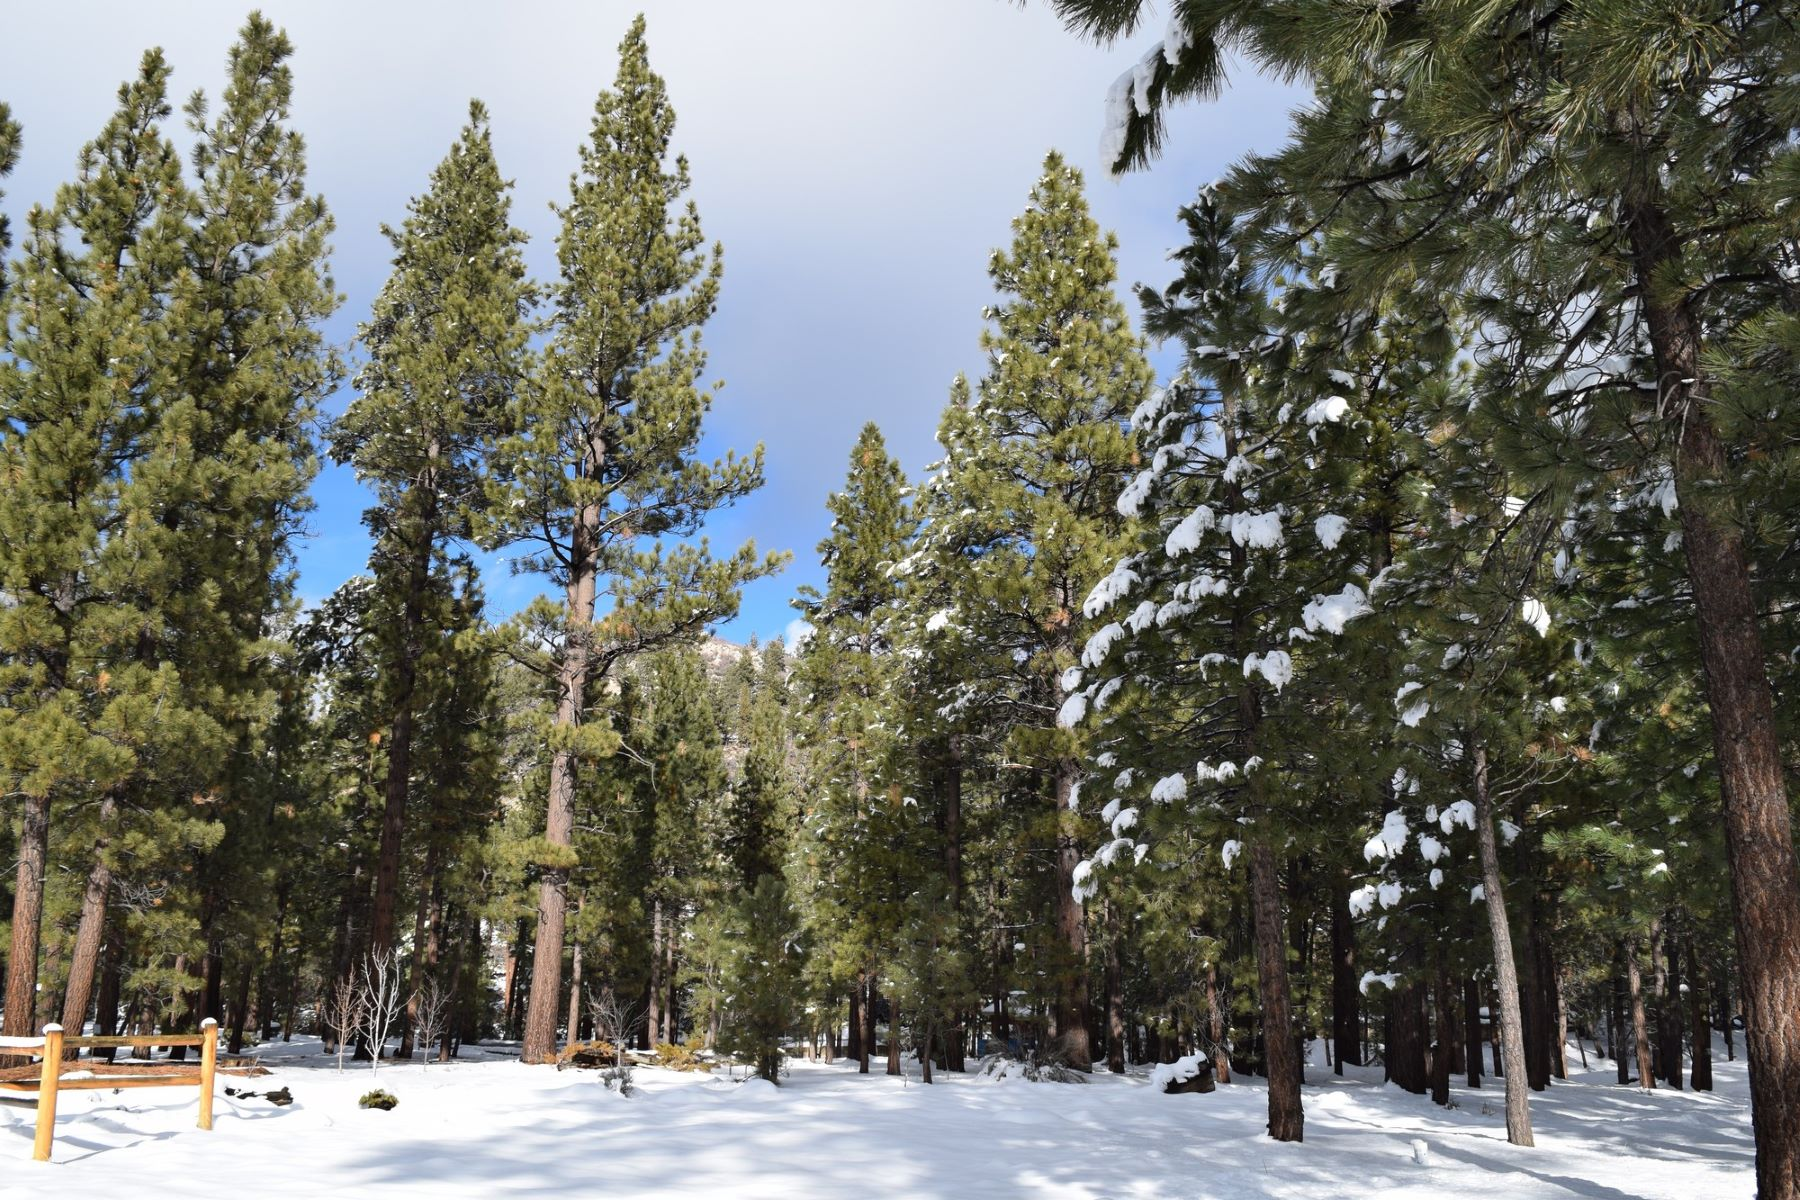 Terreno para Venda às 131 N. Starvation Flats Big Bear Lake, Califórnia, 92315 Estados Unidos